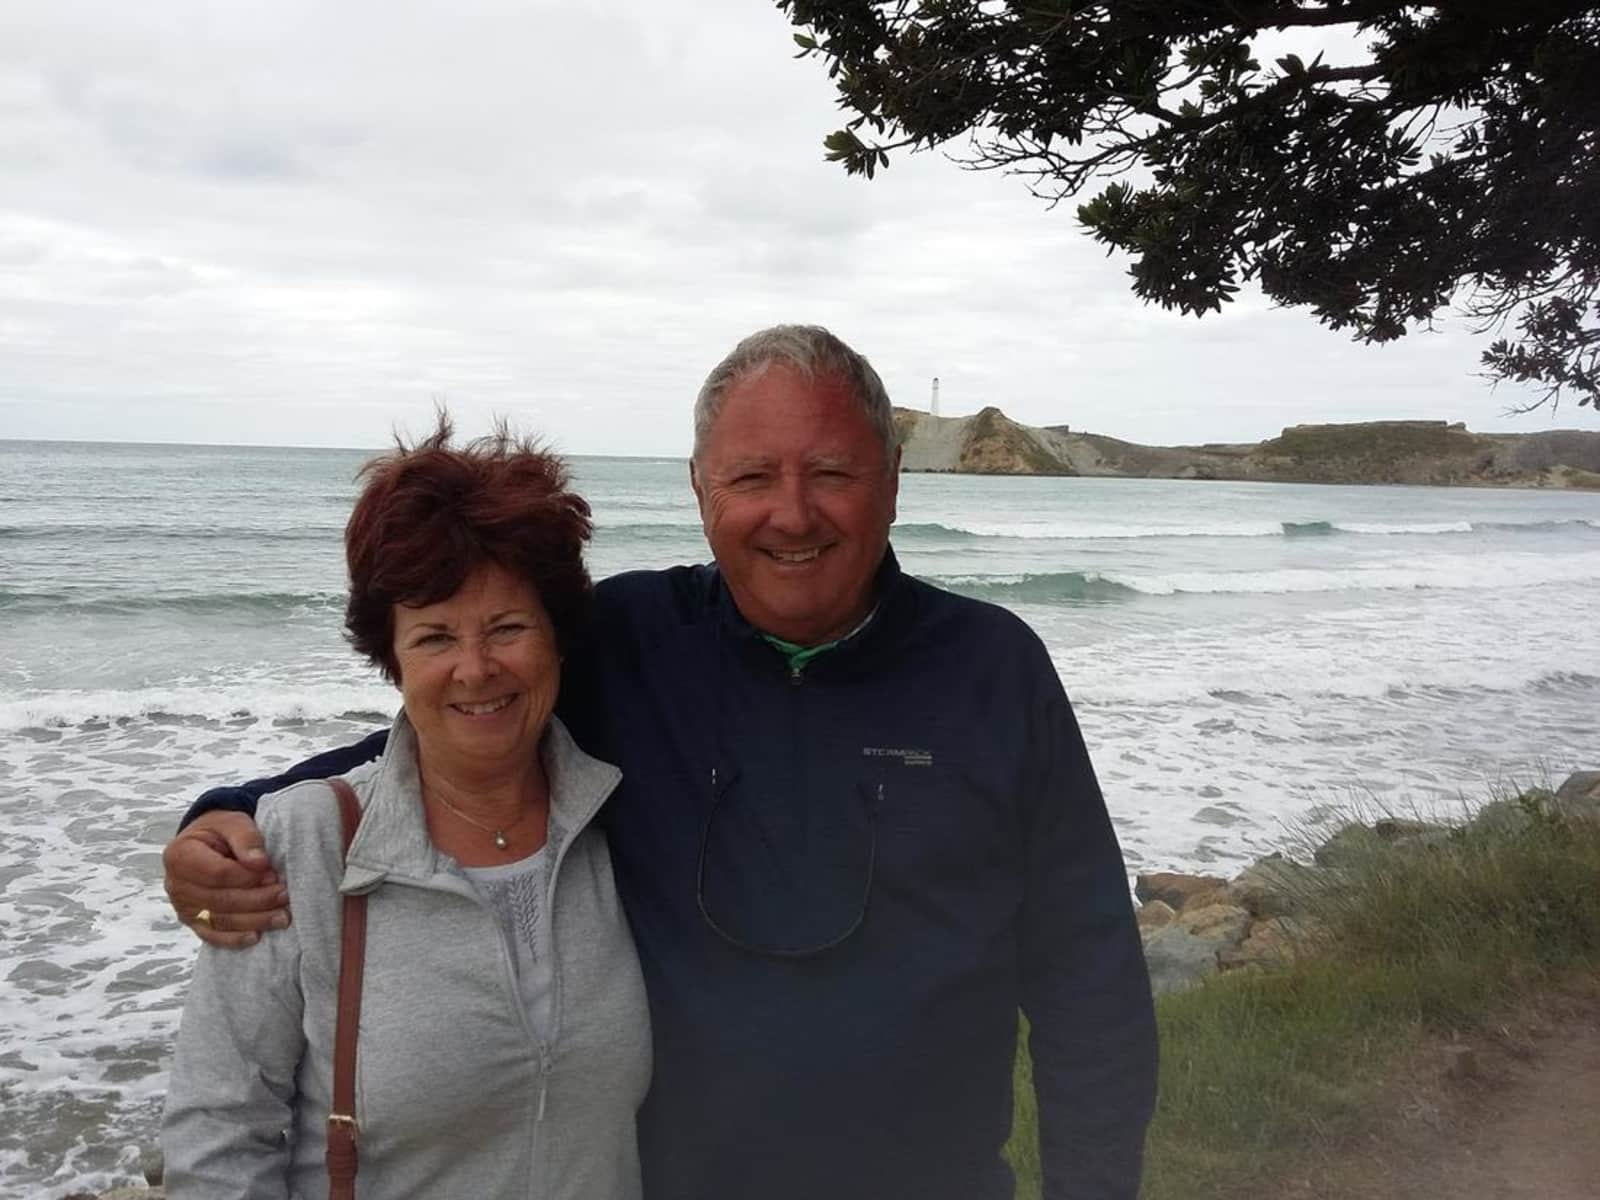 Emily & Kerry from Mojacar, Spain